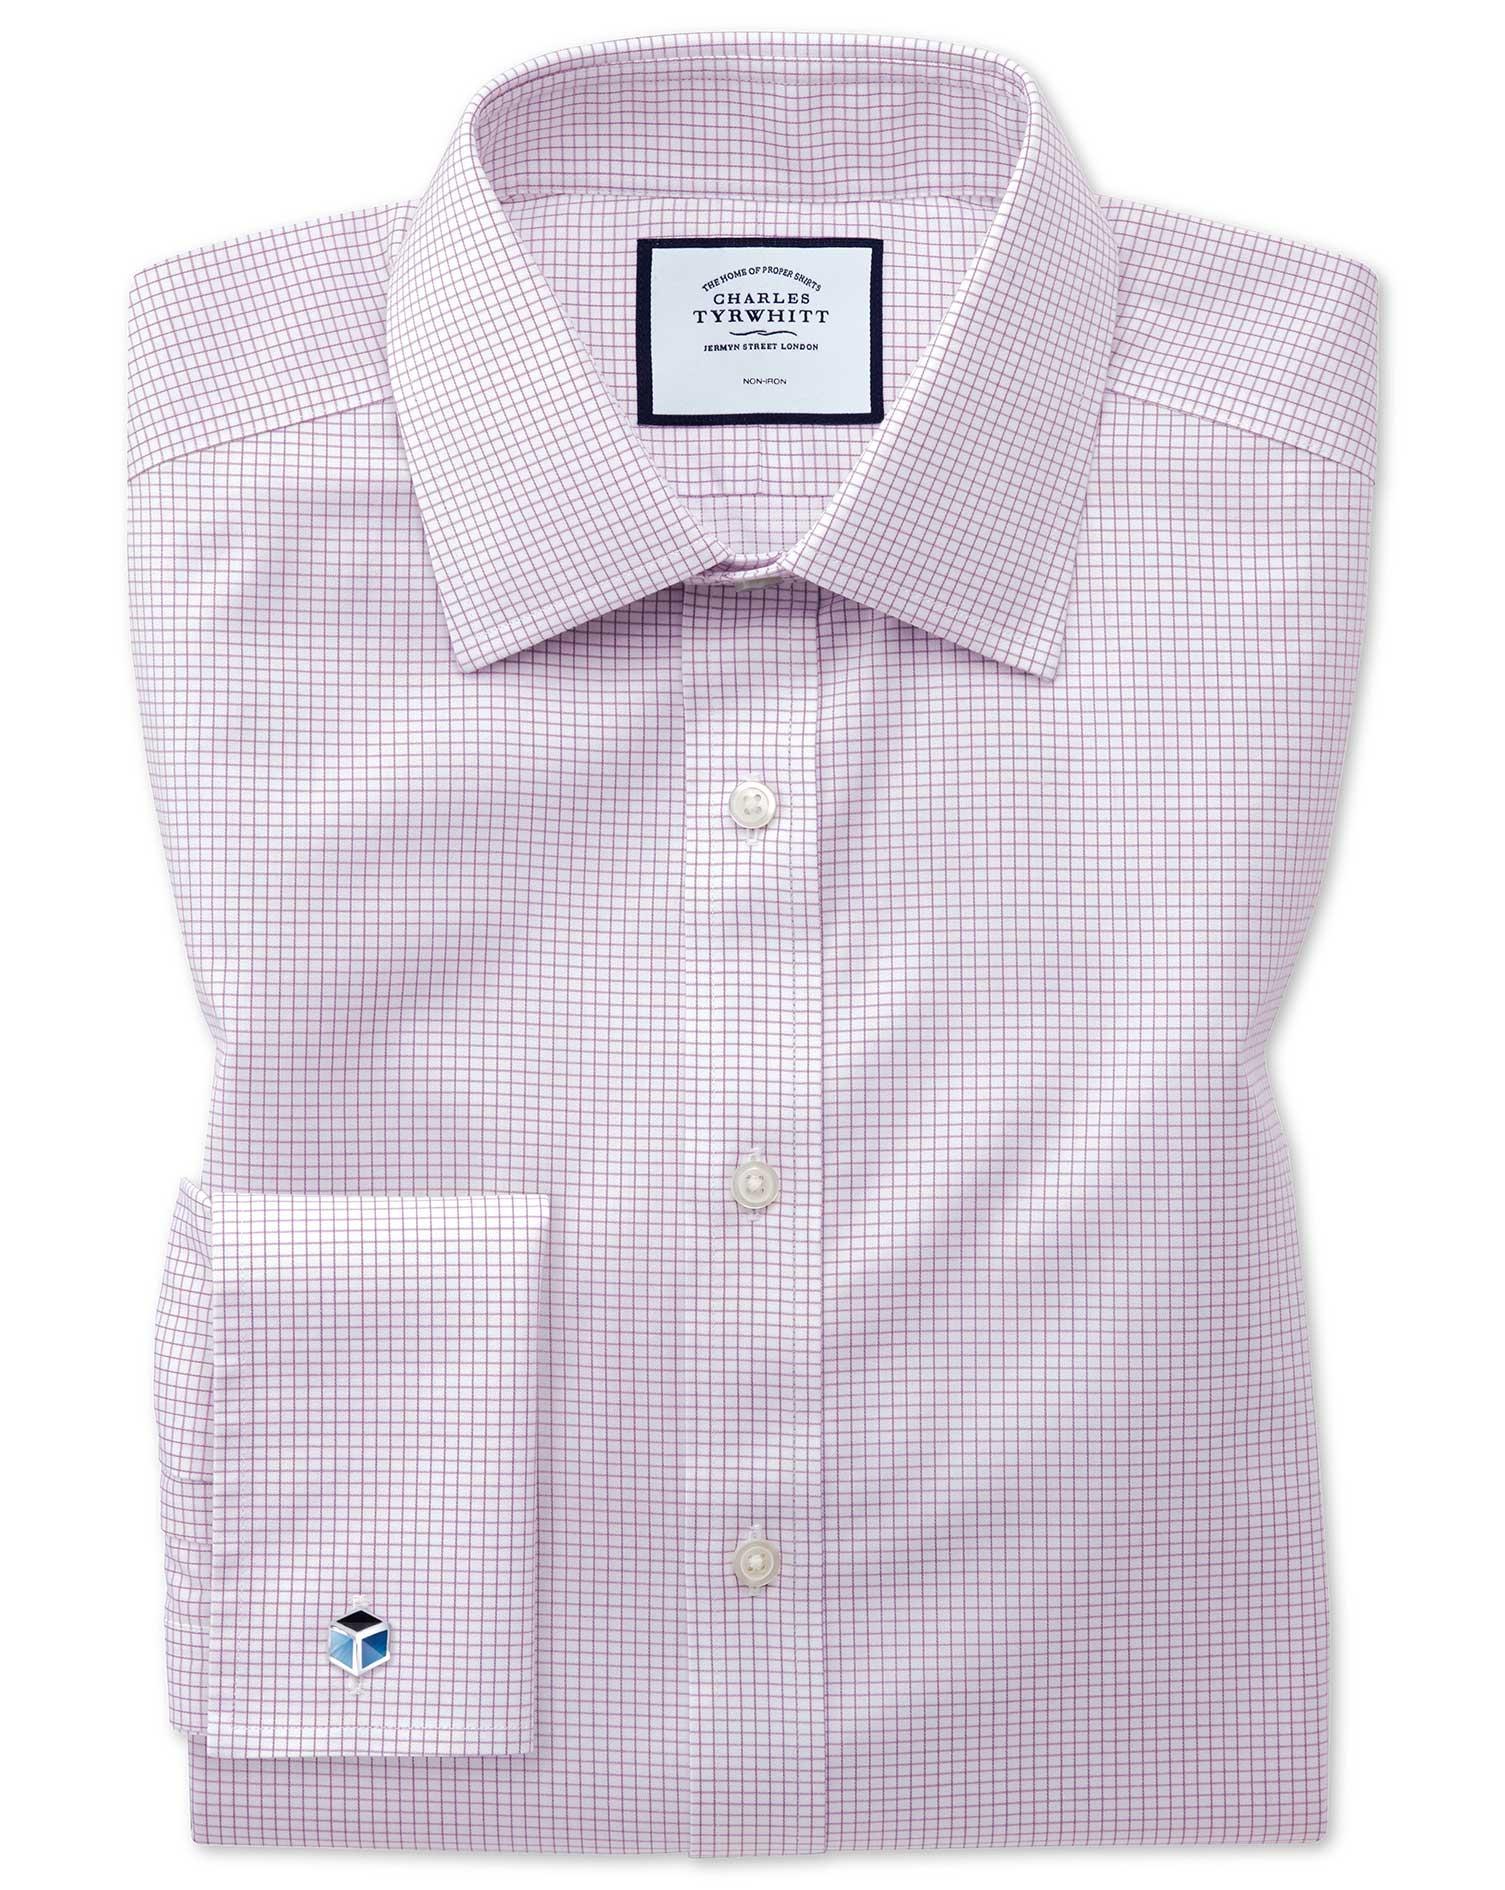 Extra Slim Fit Non-Iron Twill Mini Grid Check Purple Cotton Formal Shirt Single Cuff Size 17/35 by C